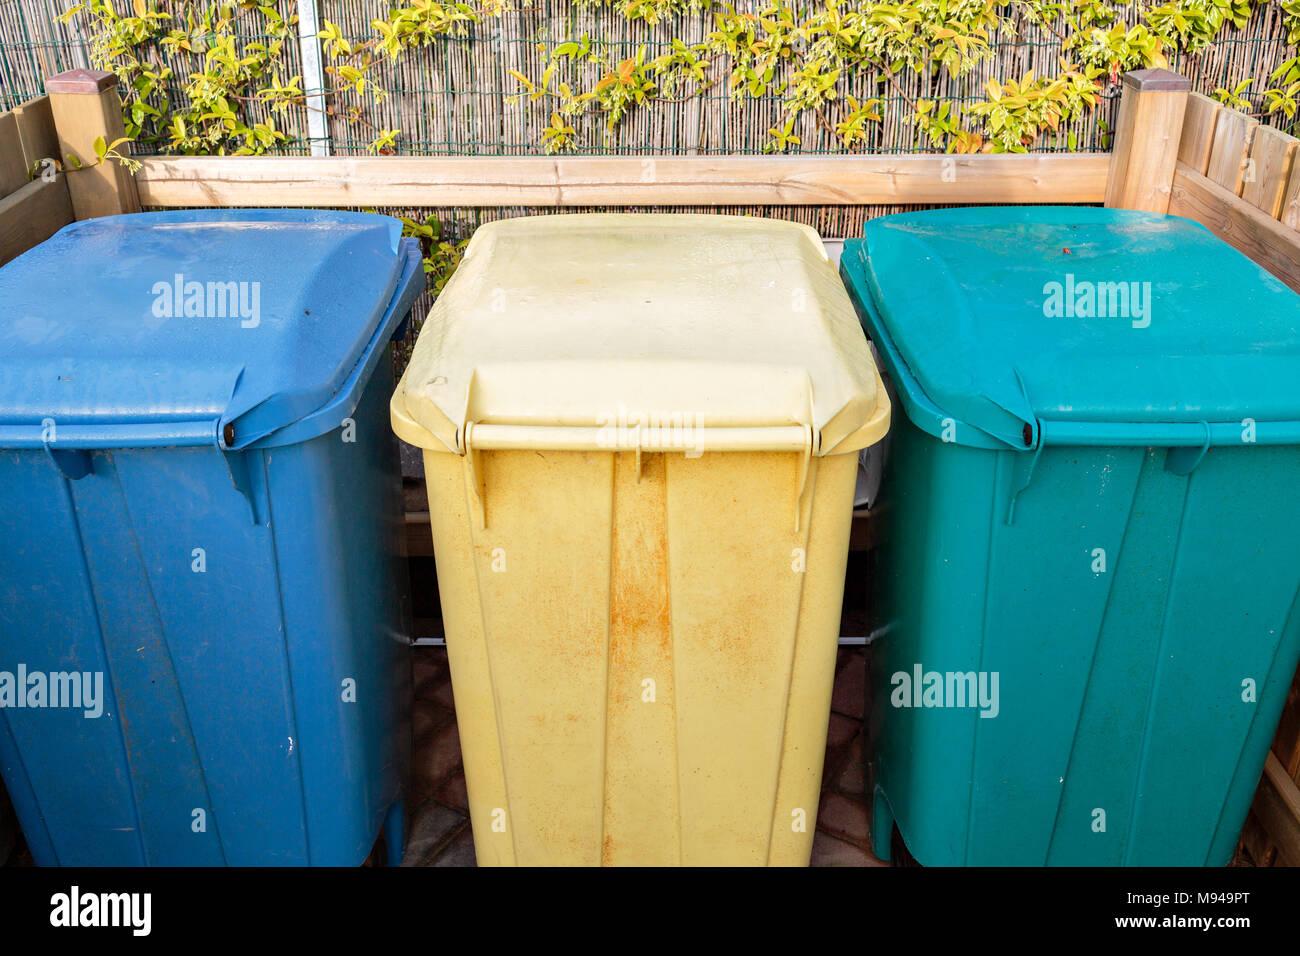 Three types of waste separation tanks on the beach in Italy. Hazardous waste, Dry garbage, wet waste. Environmental care Organize trash bins to separate for easy management. Environmental care - Stock Image